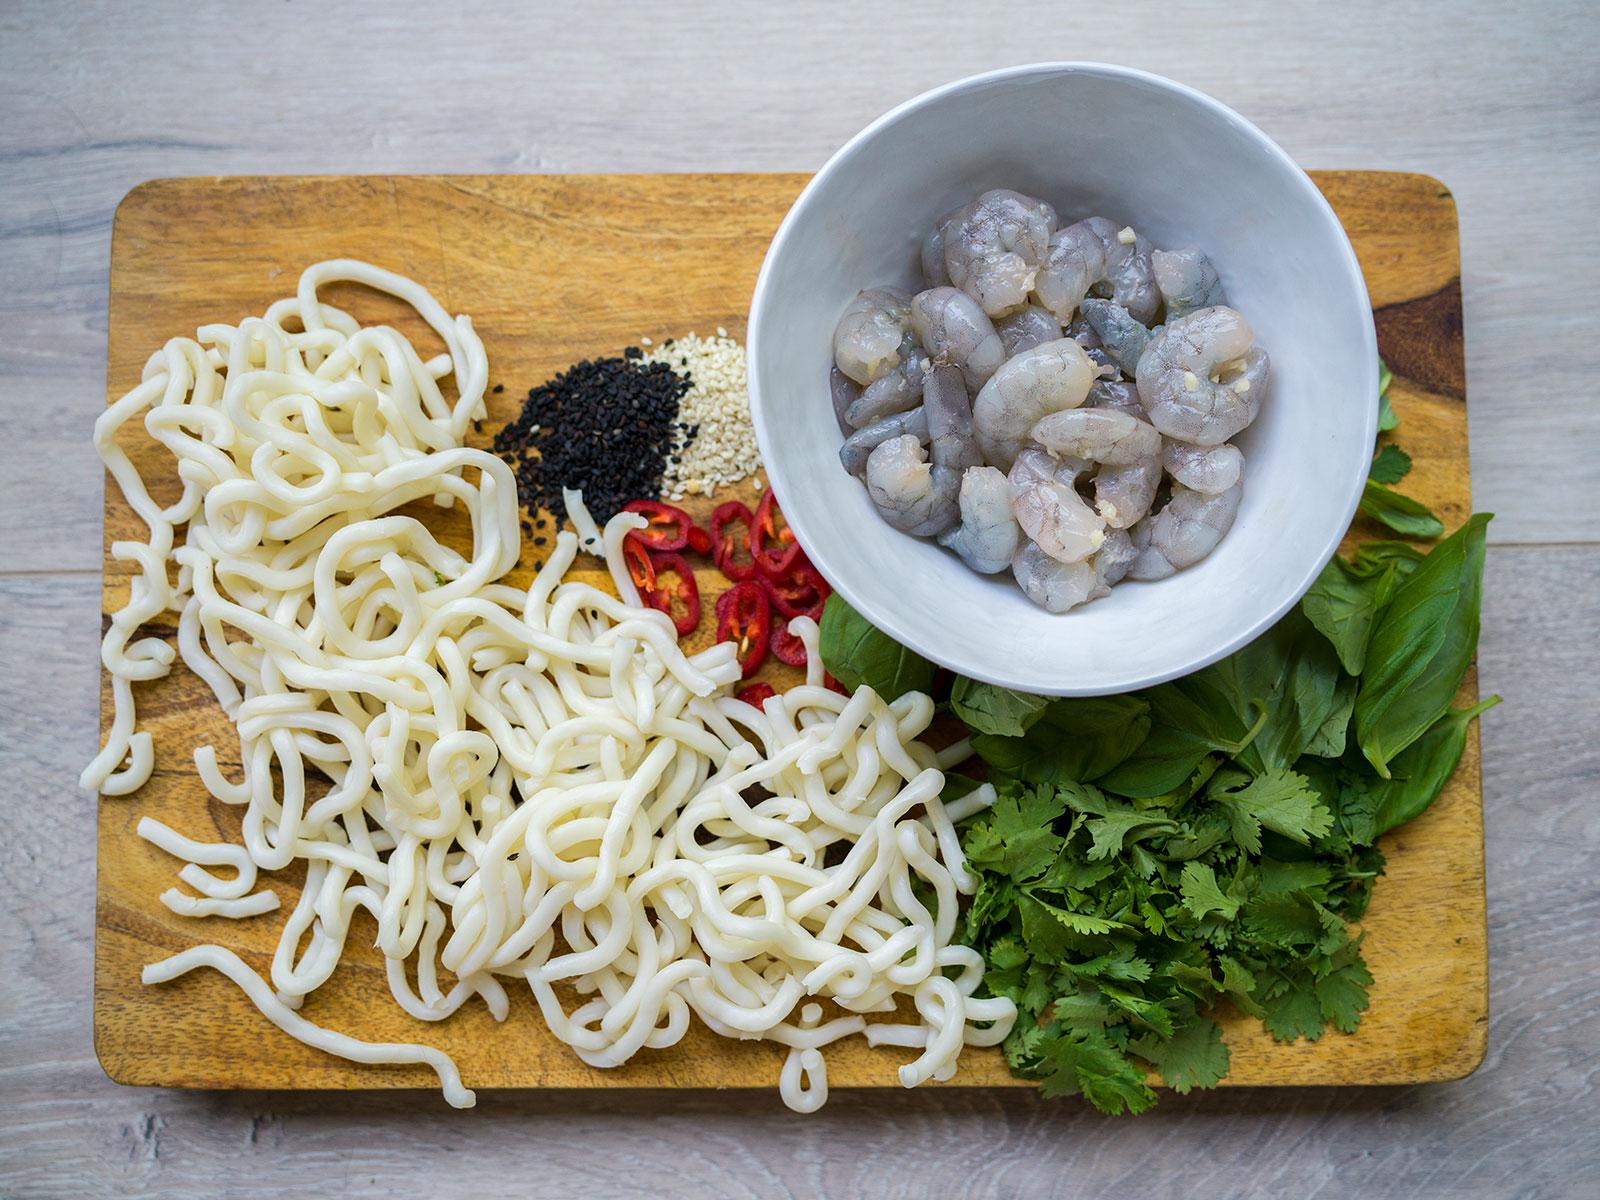 Noodles, sesame seeds, chilli, herbs & prawns